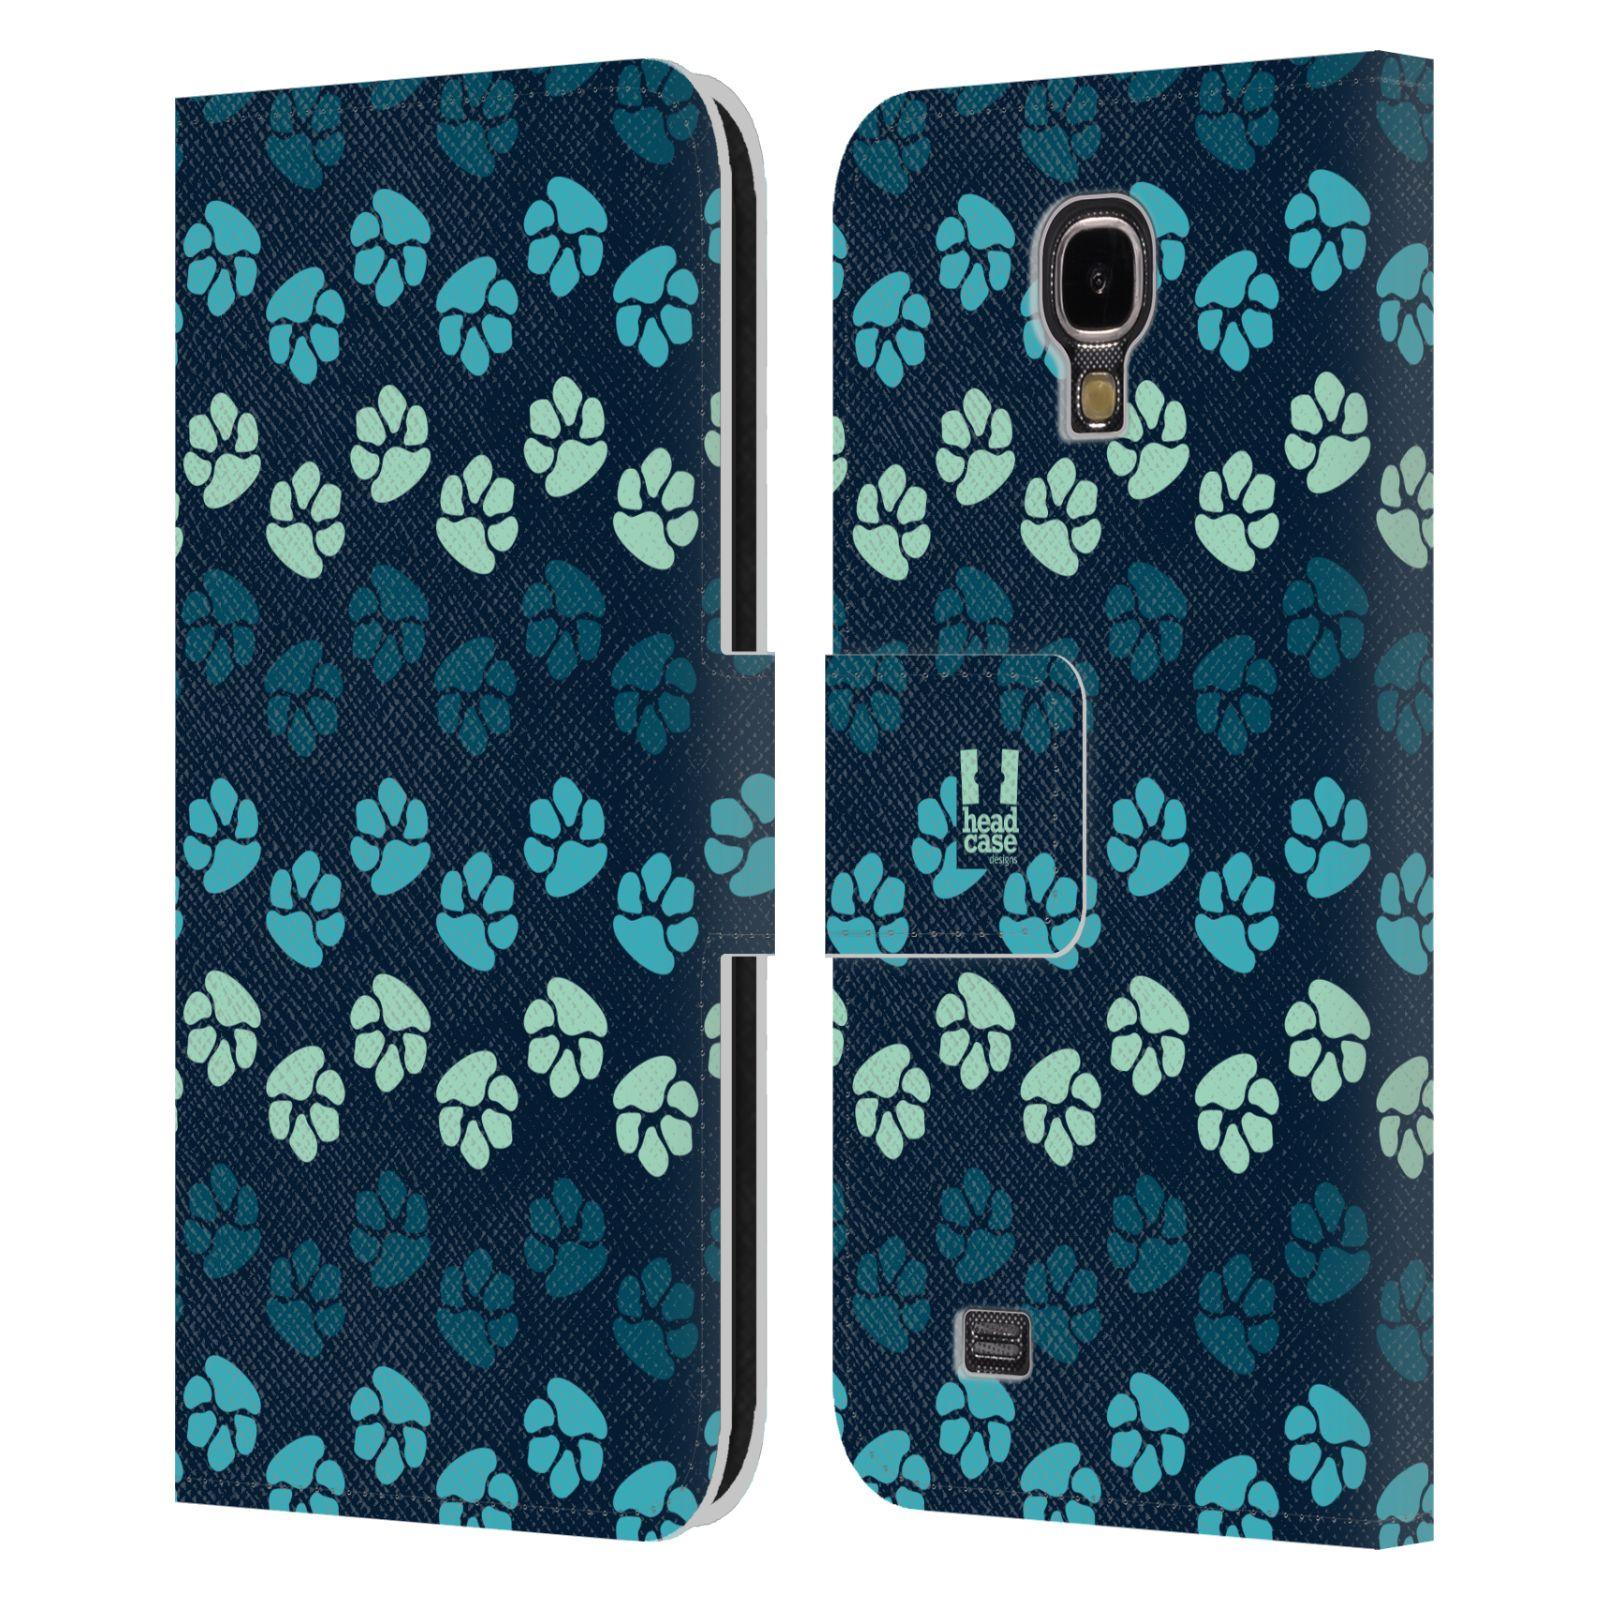 HEAD CASE Flipové pouzdro pro mobil Samsung Galaxy S4 Pejsek ťapky modrá barva